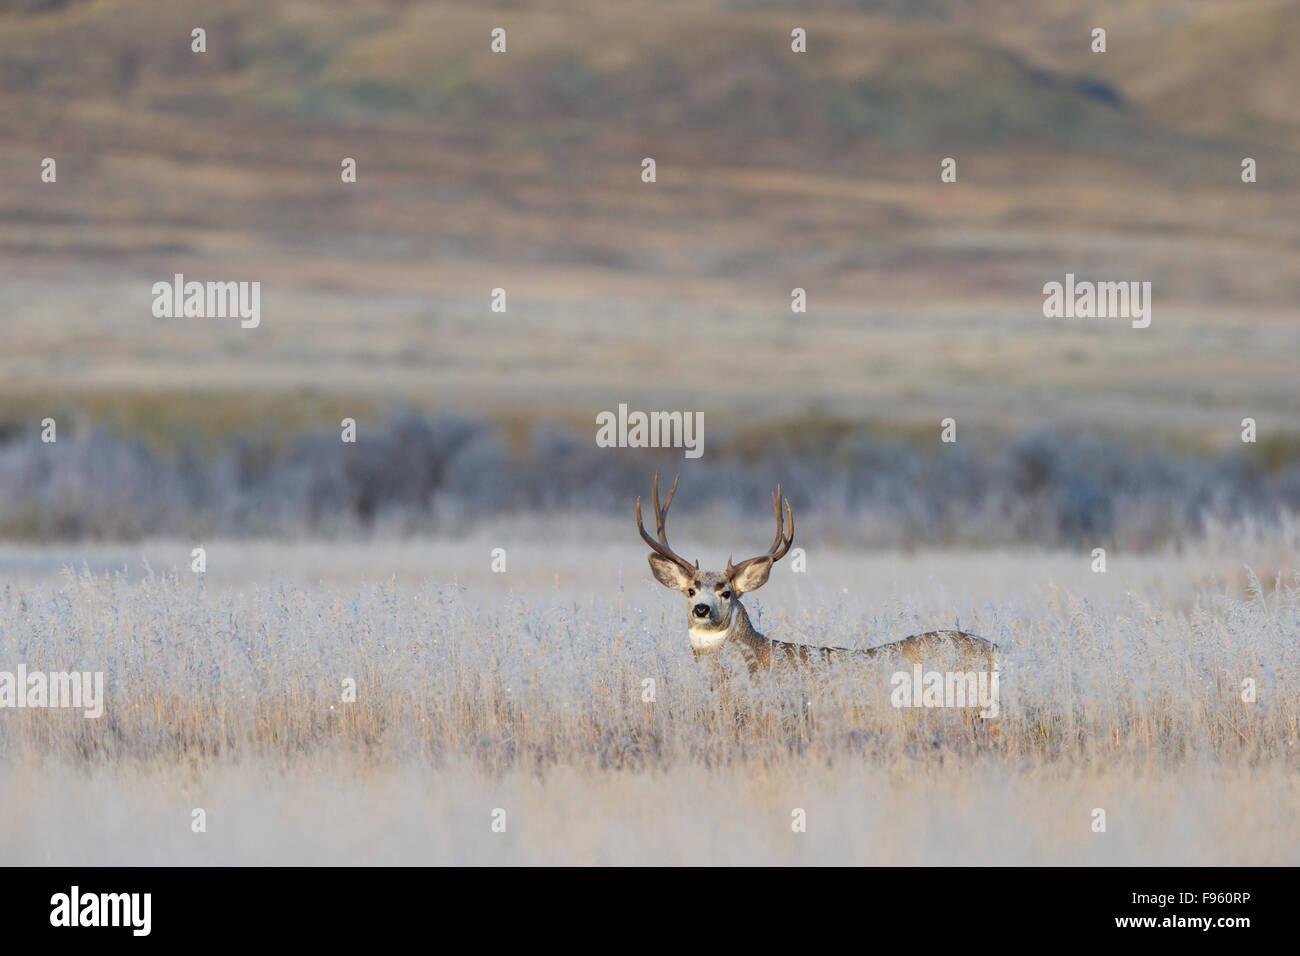 Mule deer (Odocoileus hemionus), buck on a frosty fall morning, Grasslands National Park, Saskatchewan. - Stock Image